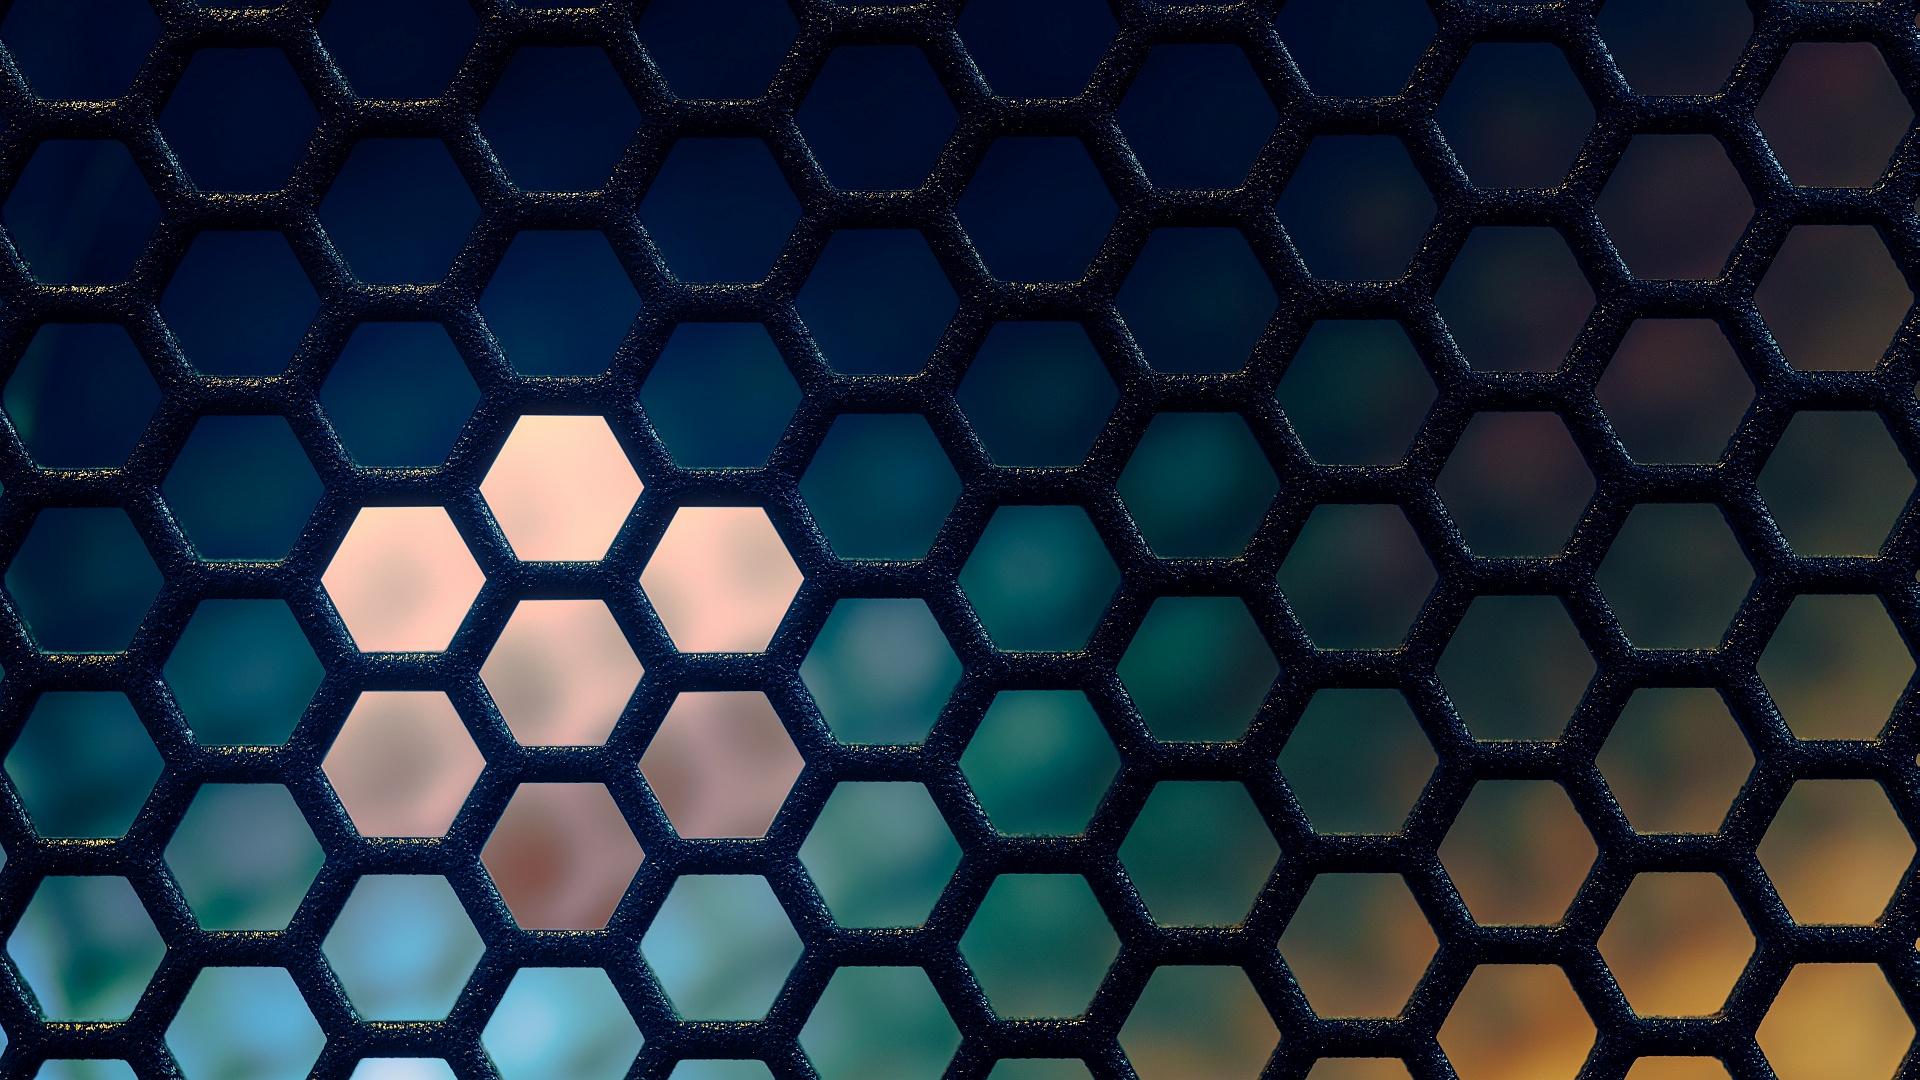 The Grid I.